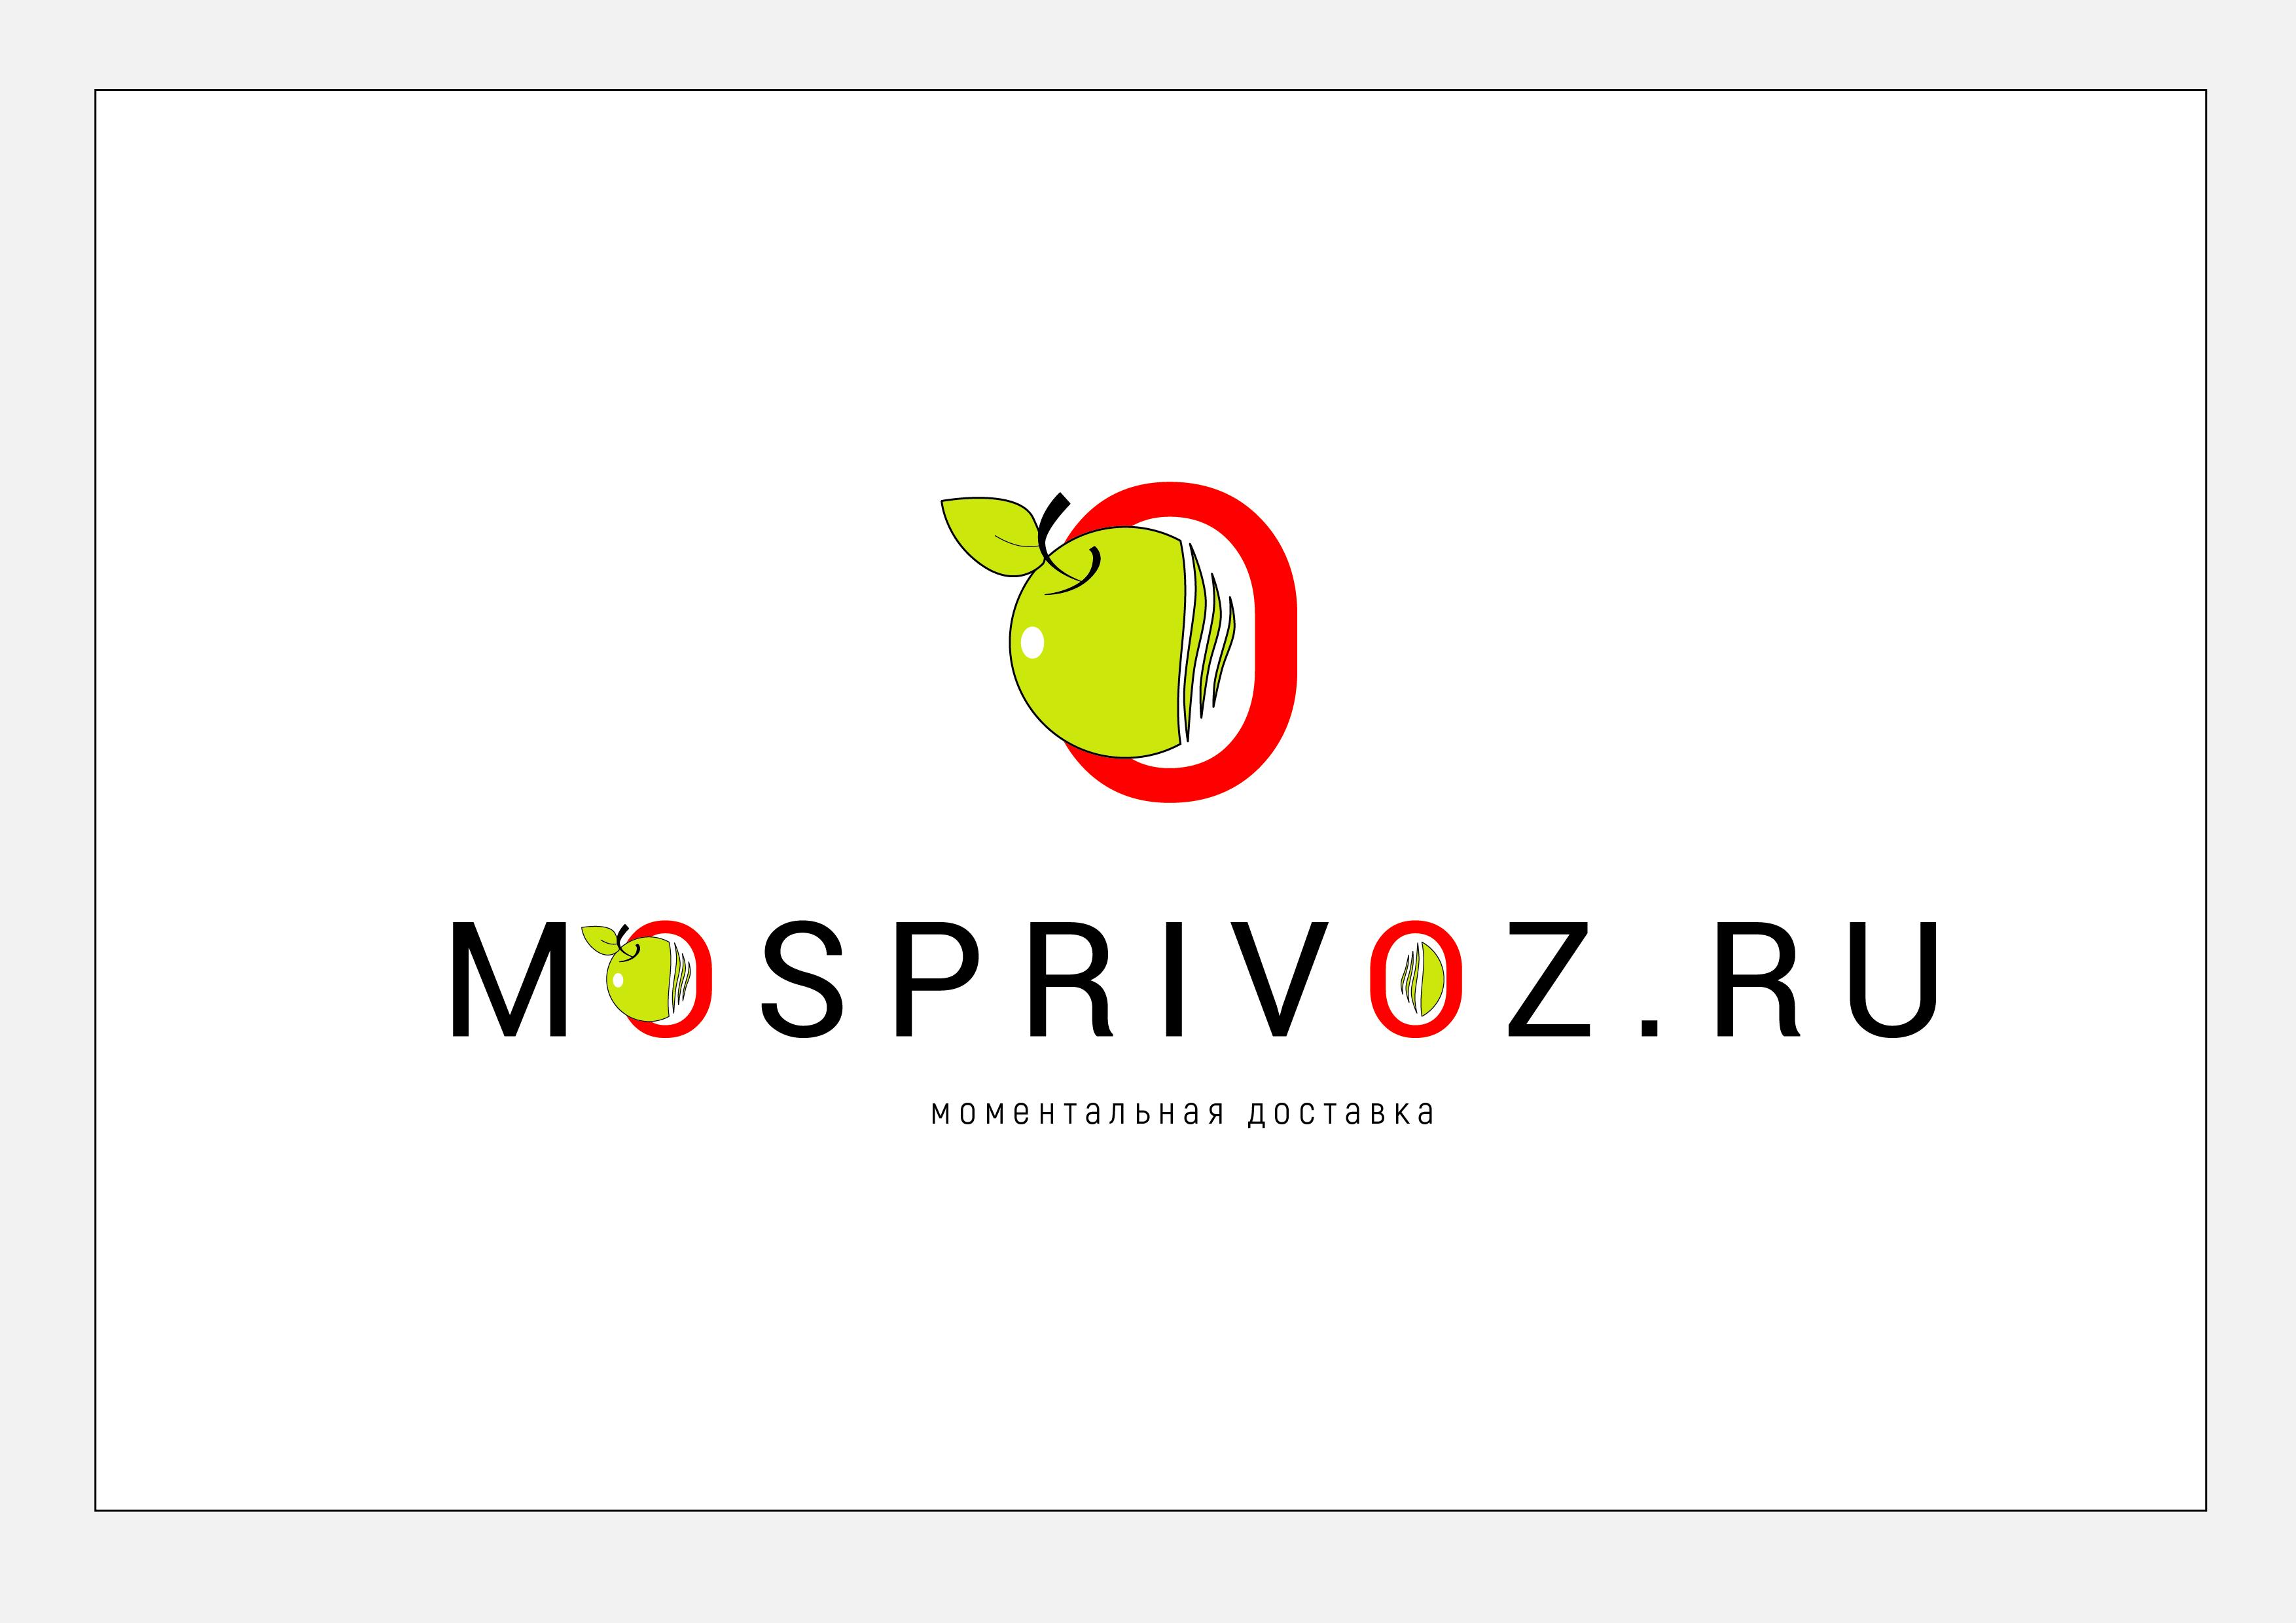 Логотип. Интернет - магазин по доставке продуктов питания. фото f_8875ad88ee2226fc.png